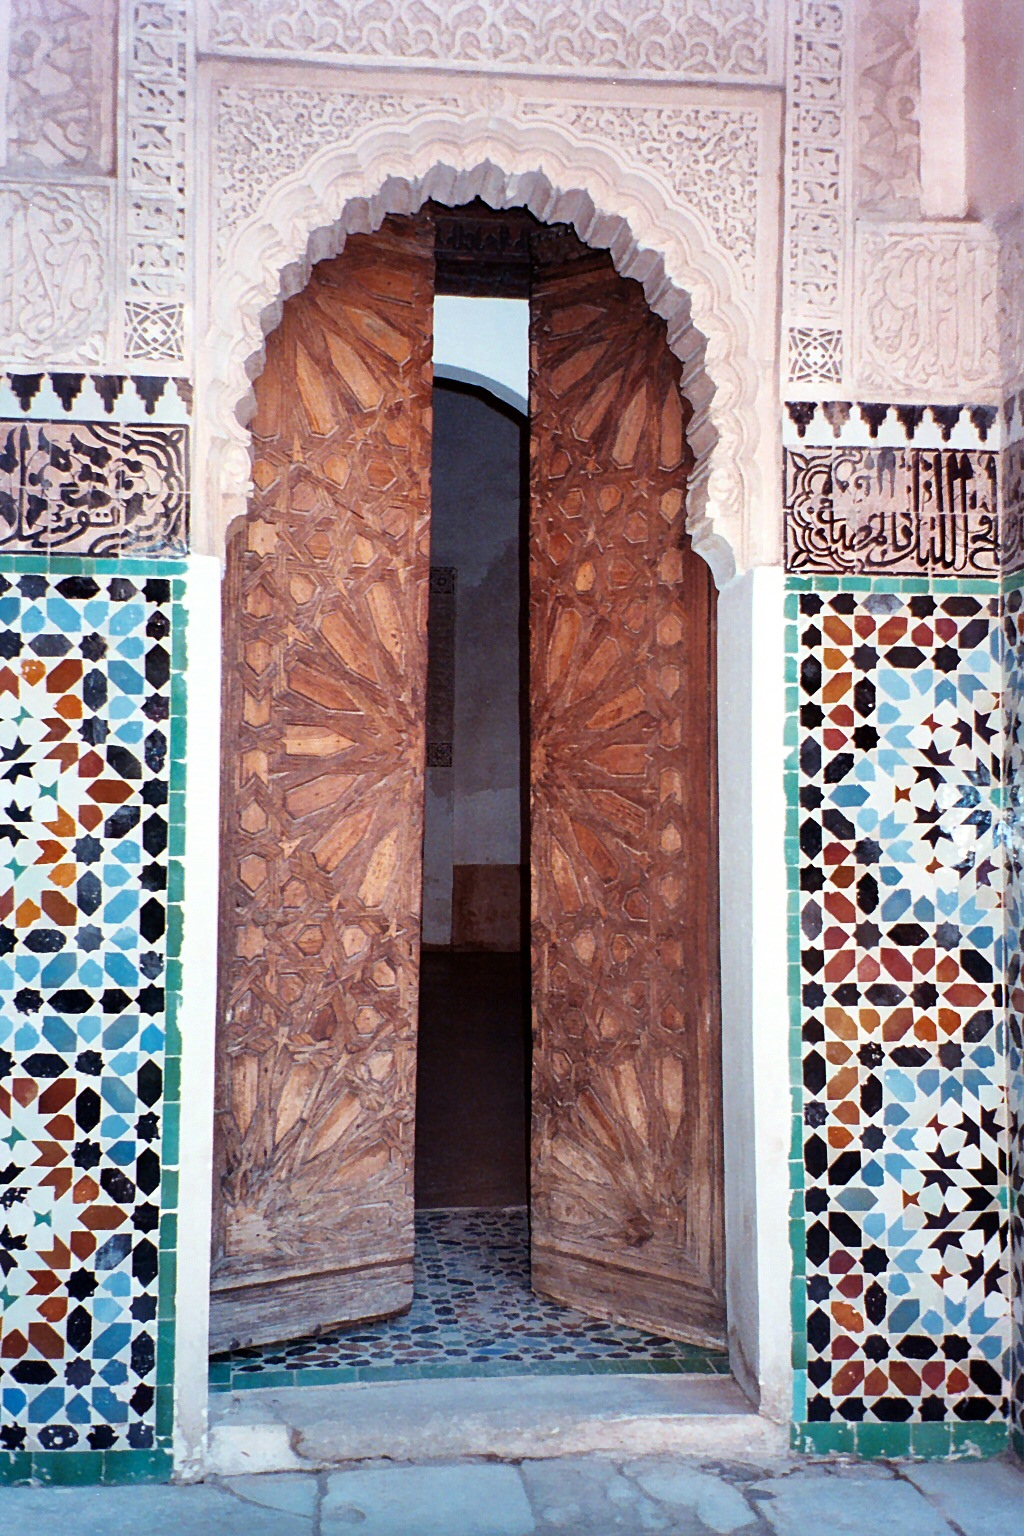 Islamic geometric patterns   Wikipedia 1024x1536